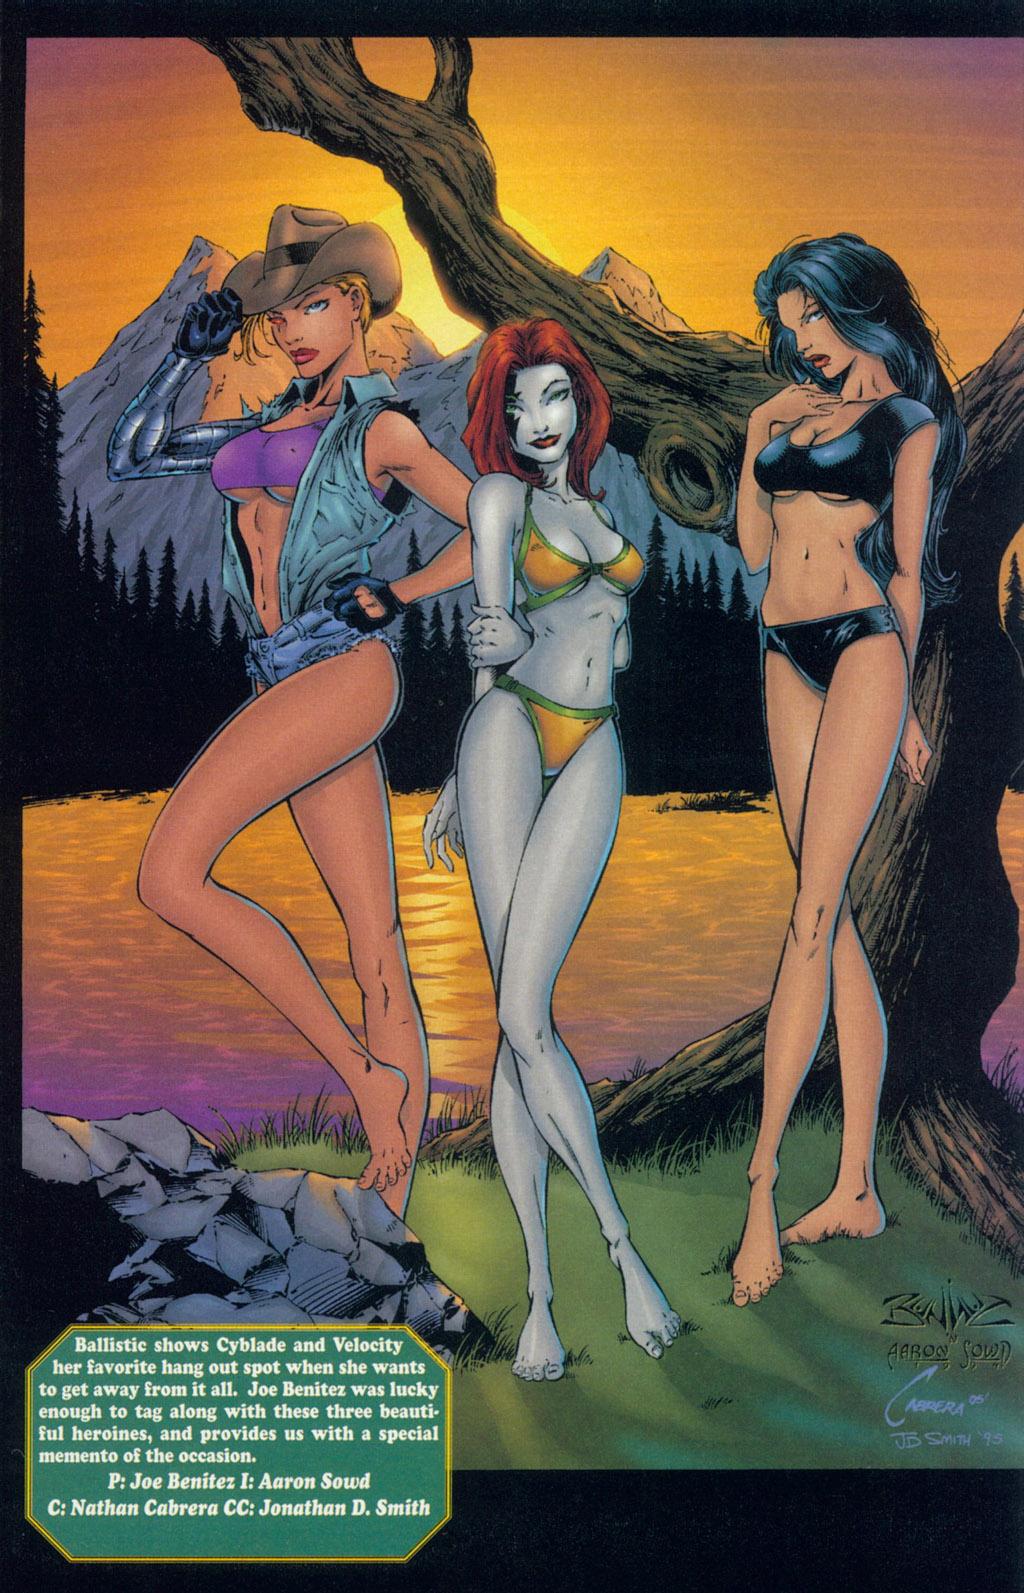 Read online Ballistic Studios Swimsuit Special comic -  Issue #1 - 7